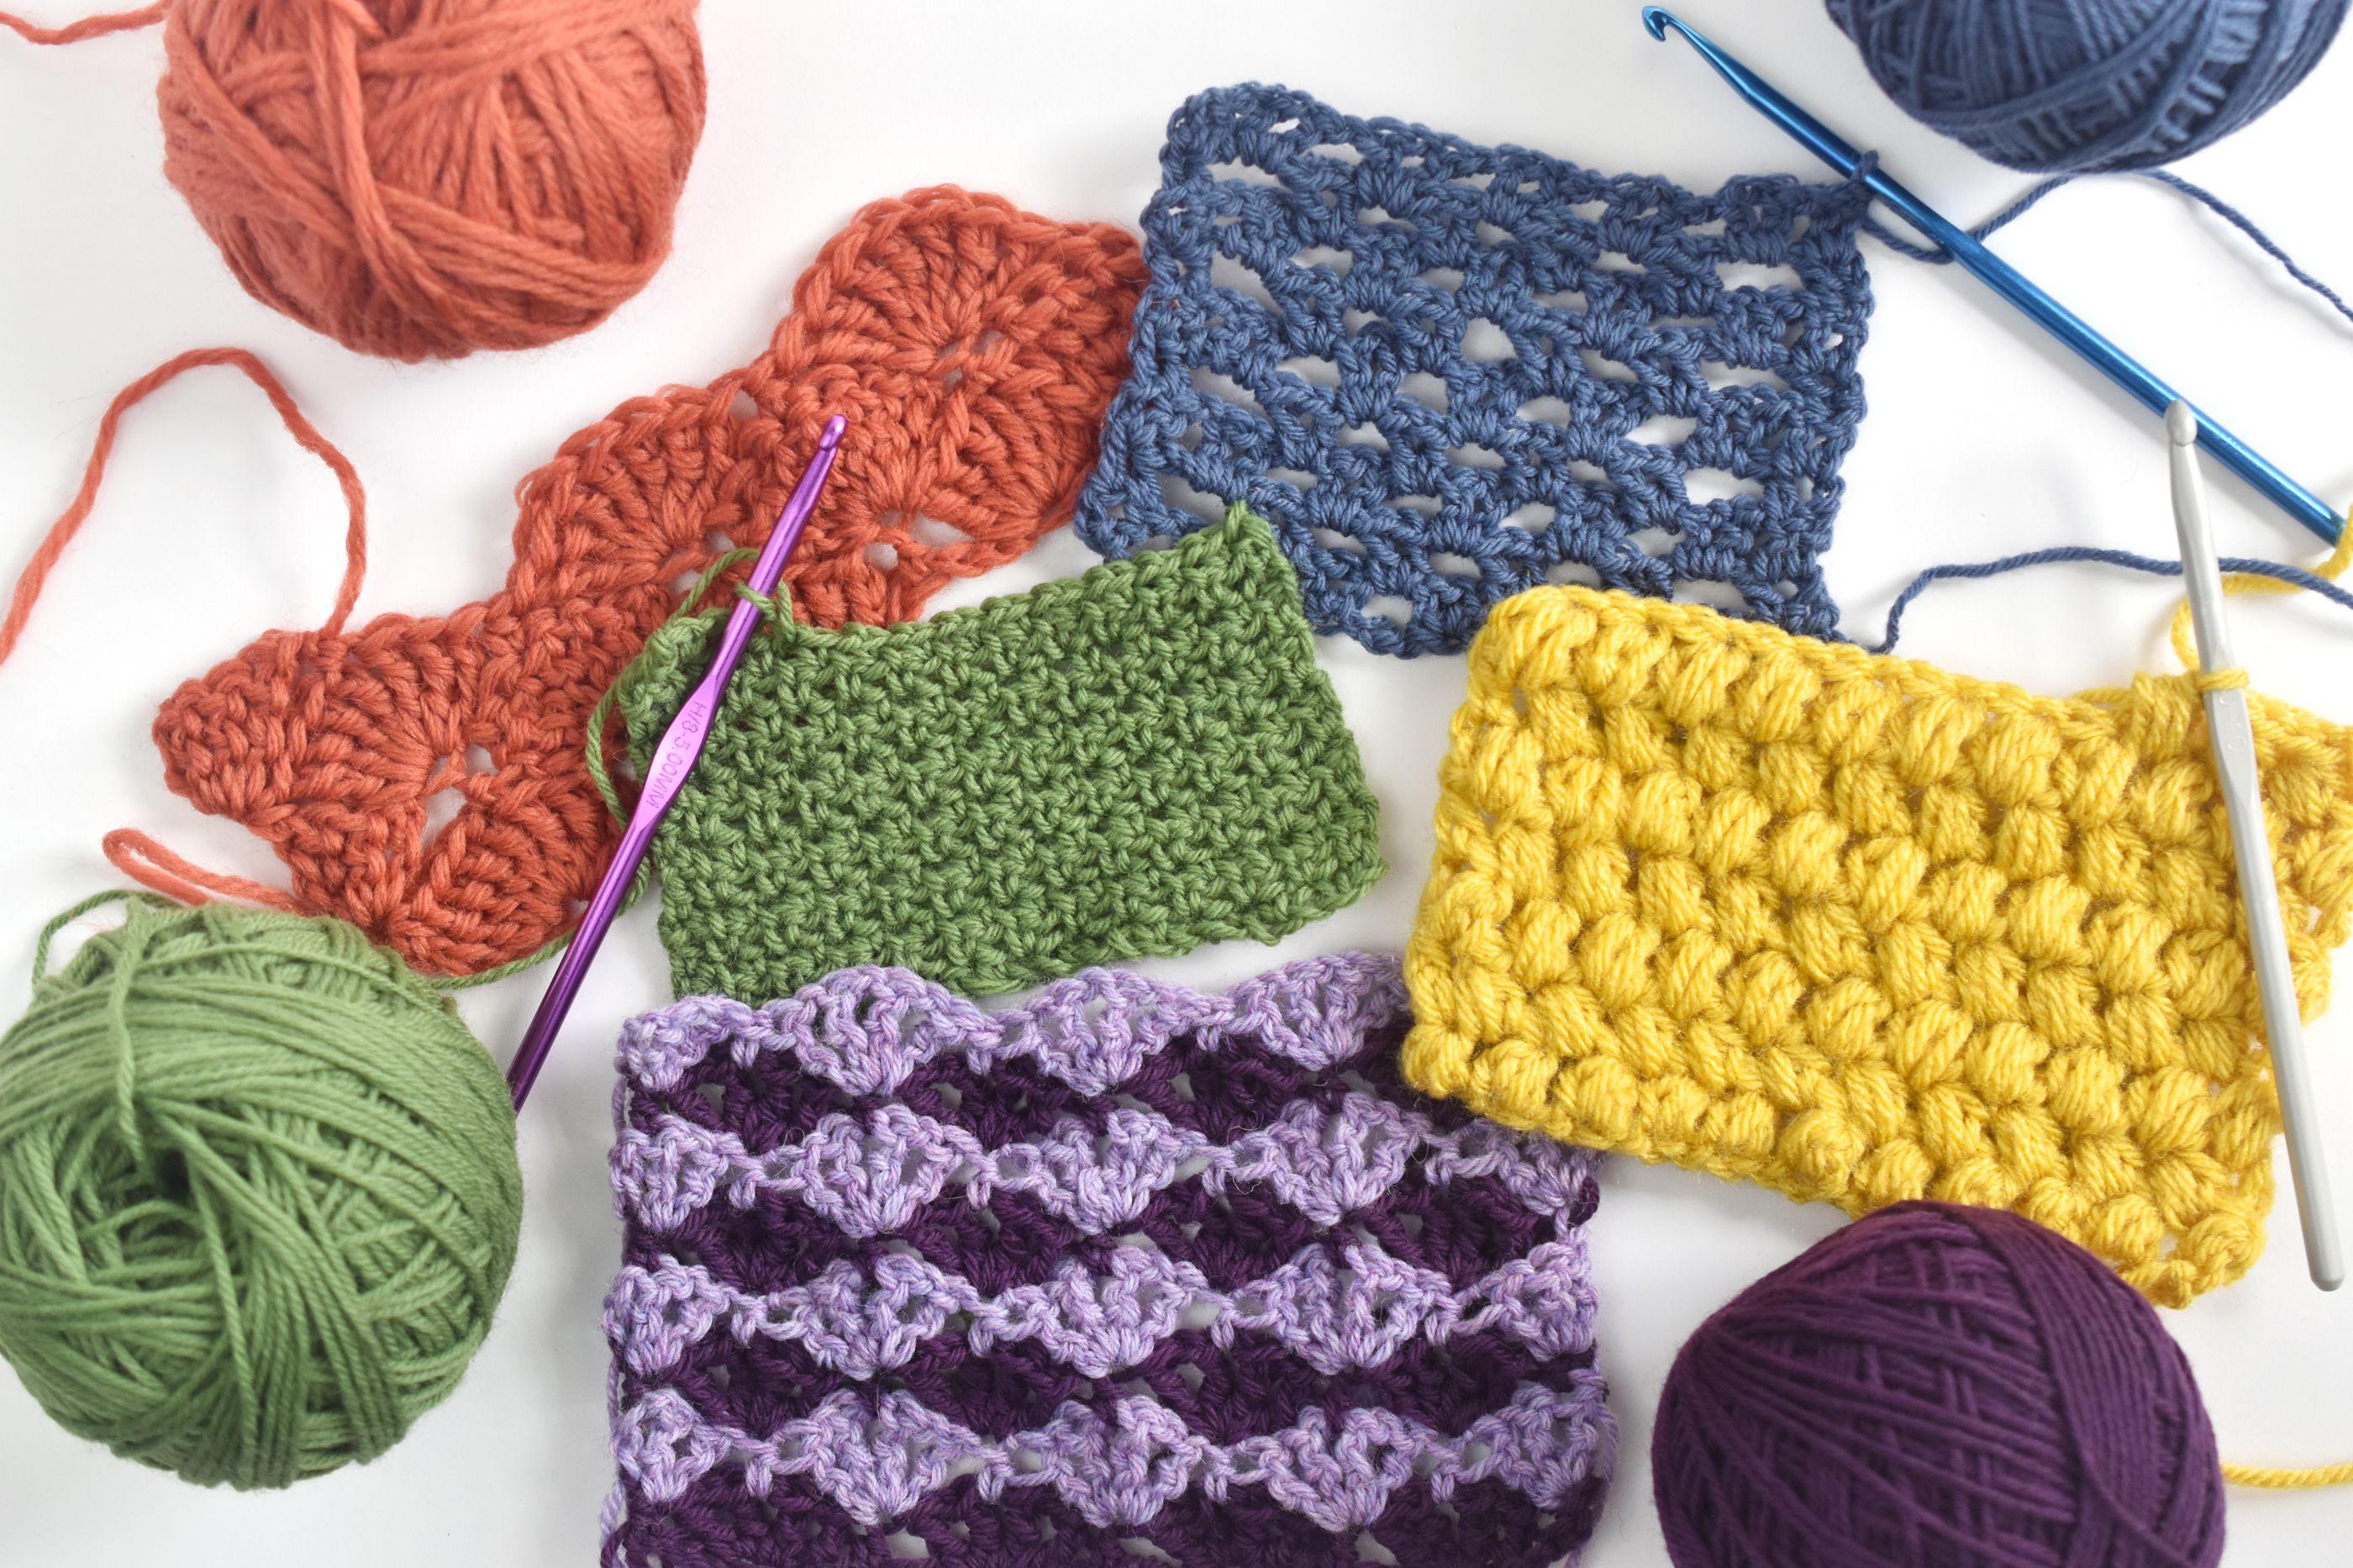 Crochet Stitch Pattern  10 Most Popular Crochet Stitches